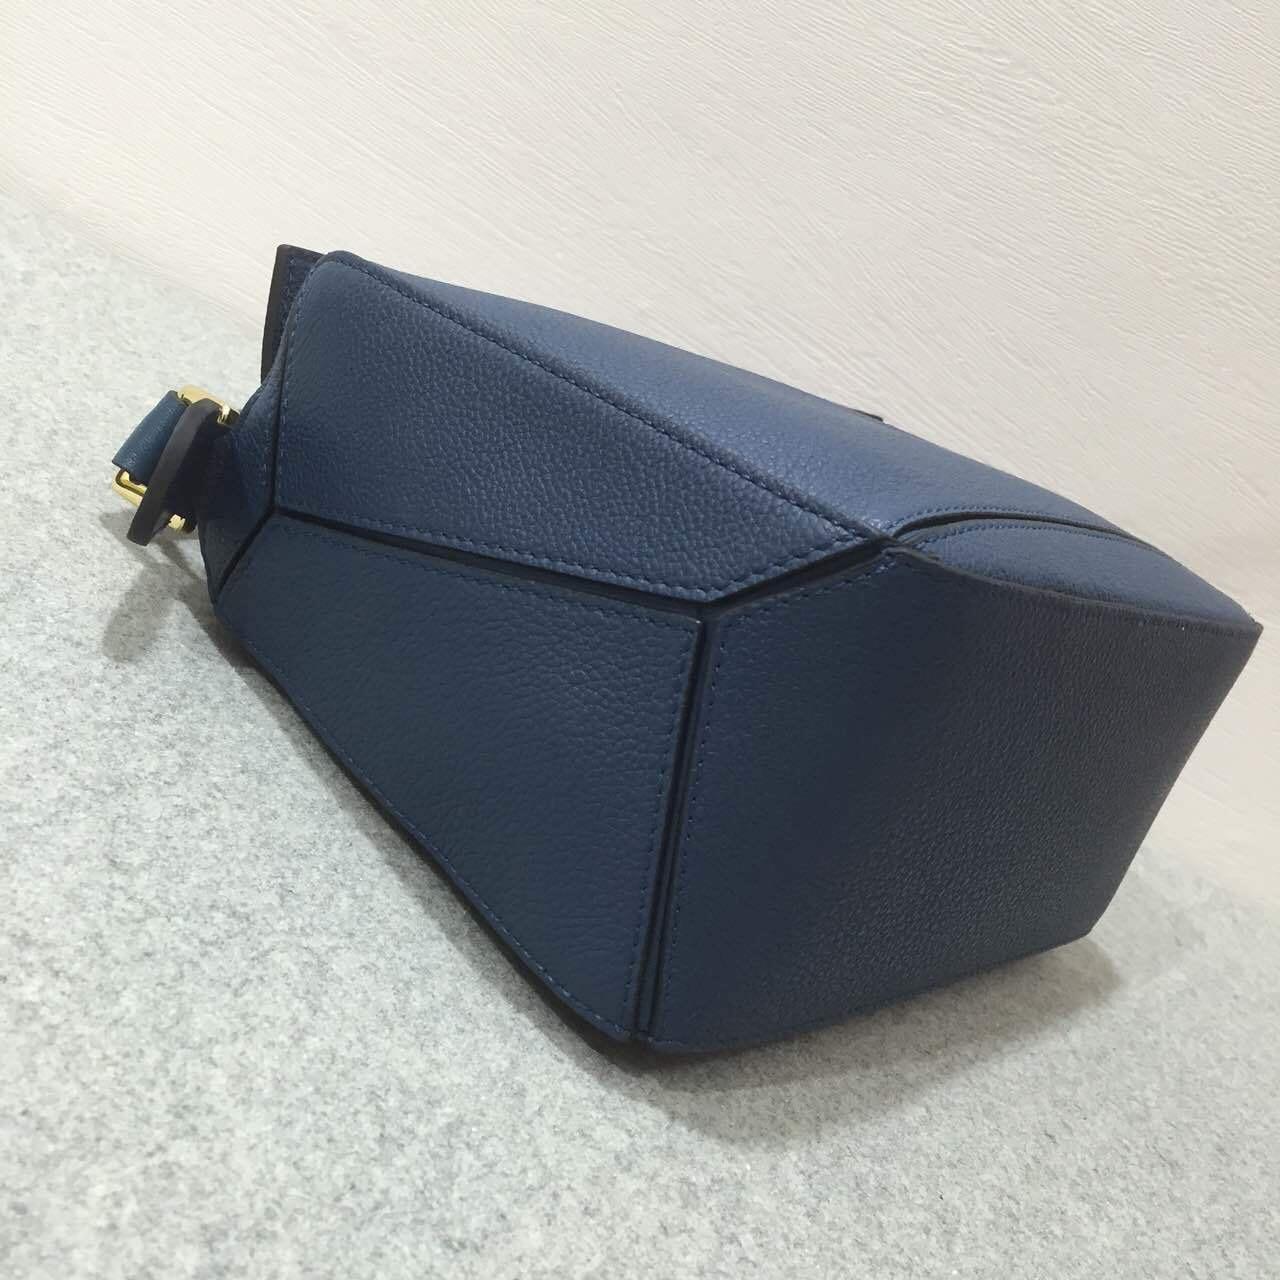 Loewe羅意威小號幾何包 Puzzle Small Bag 靛蓝色 顆粒小牛皮